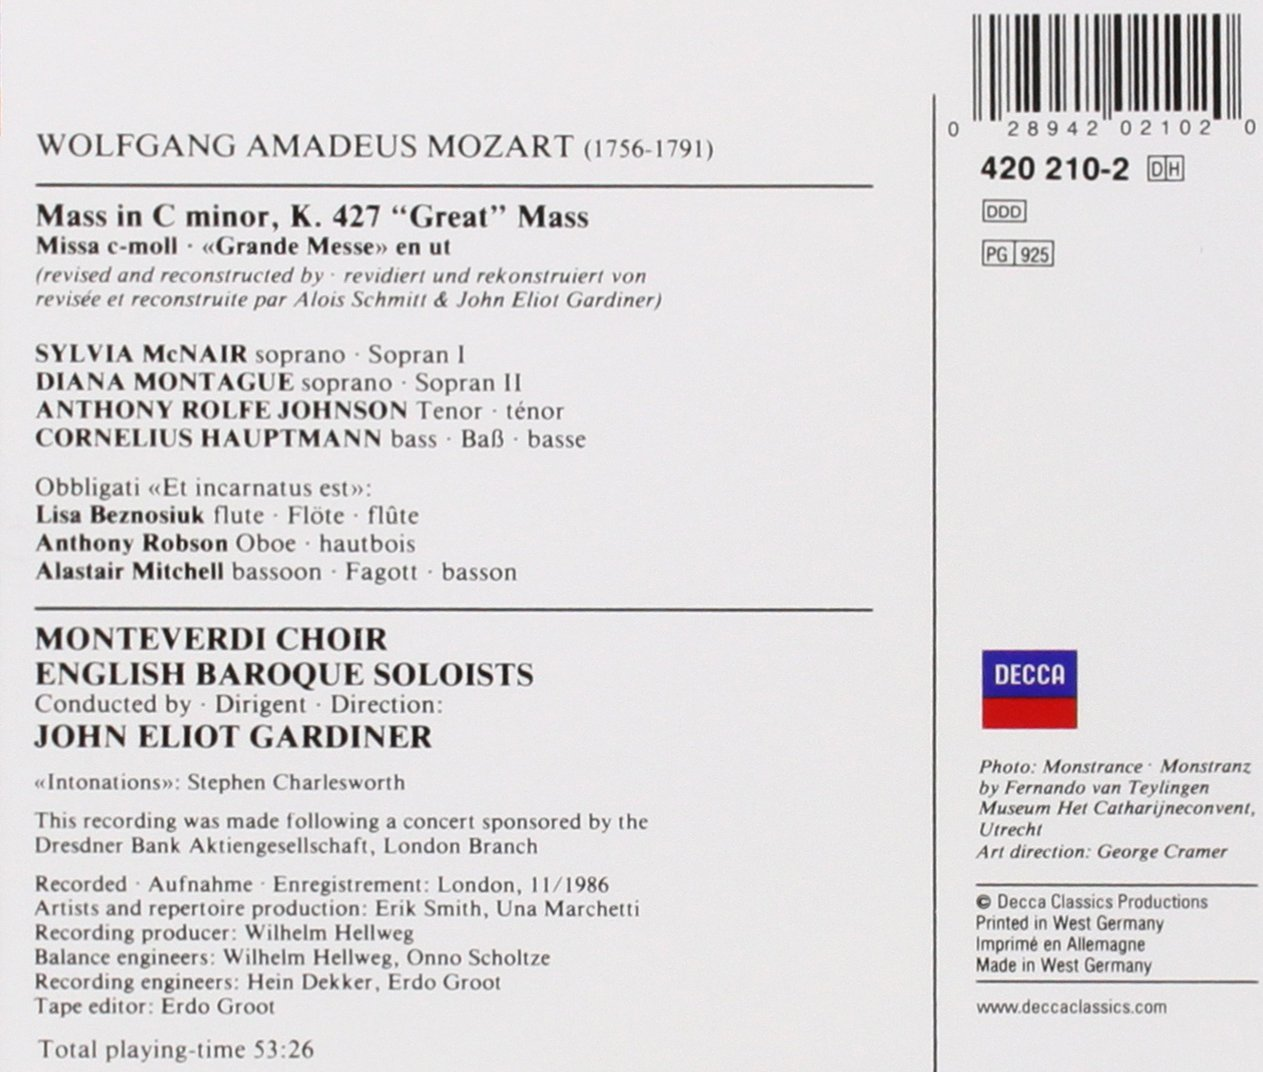 Mozart: Great Mass in C minor /McNair * Montague * Rolfe Johnson * Hauptmann * English Baroque Soloists * Gardiner